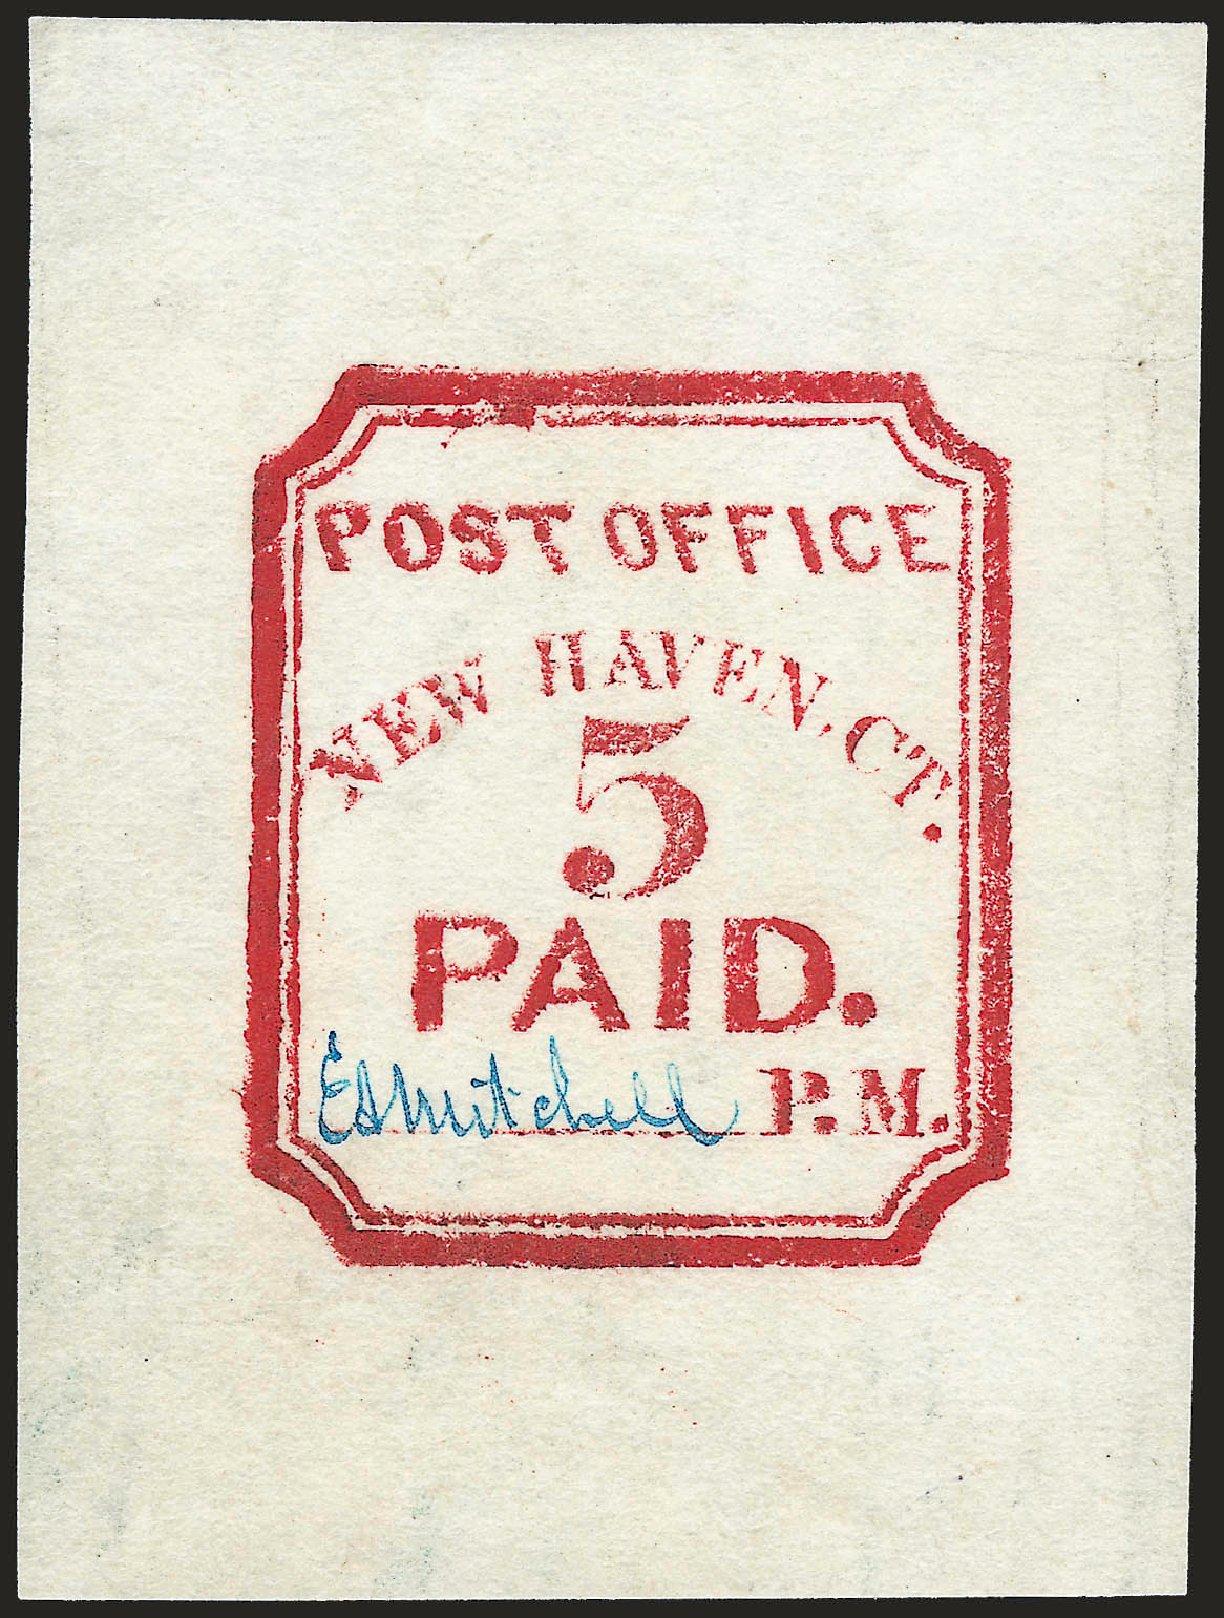 US Stamp Value Scott #8XU1: 5c 1845 New Haven Postmasters Provisional. Robert Siegel Auction Galleries, Jun 2010, Sale 992, Lot 2001